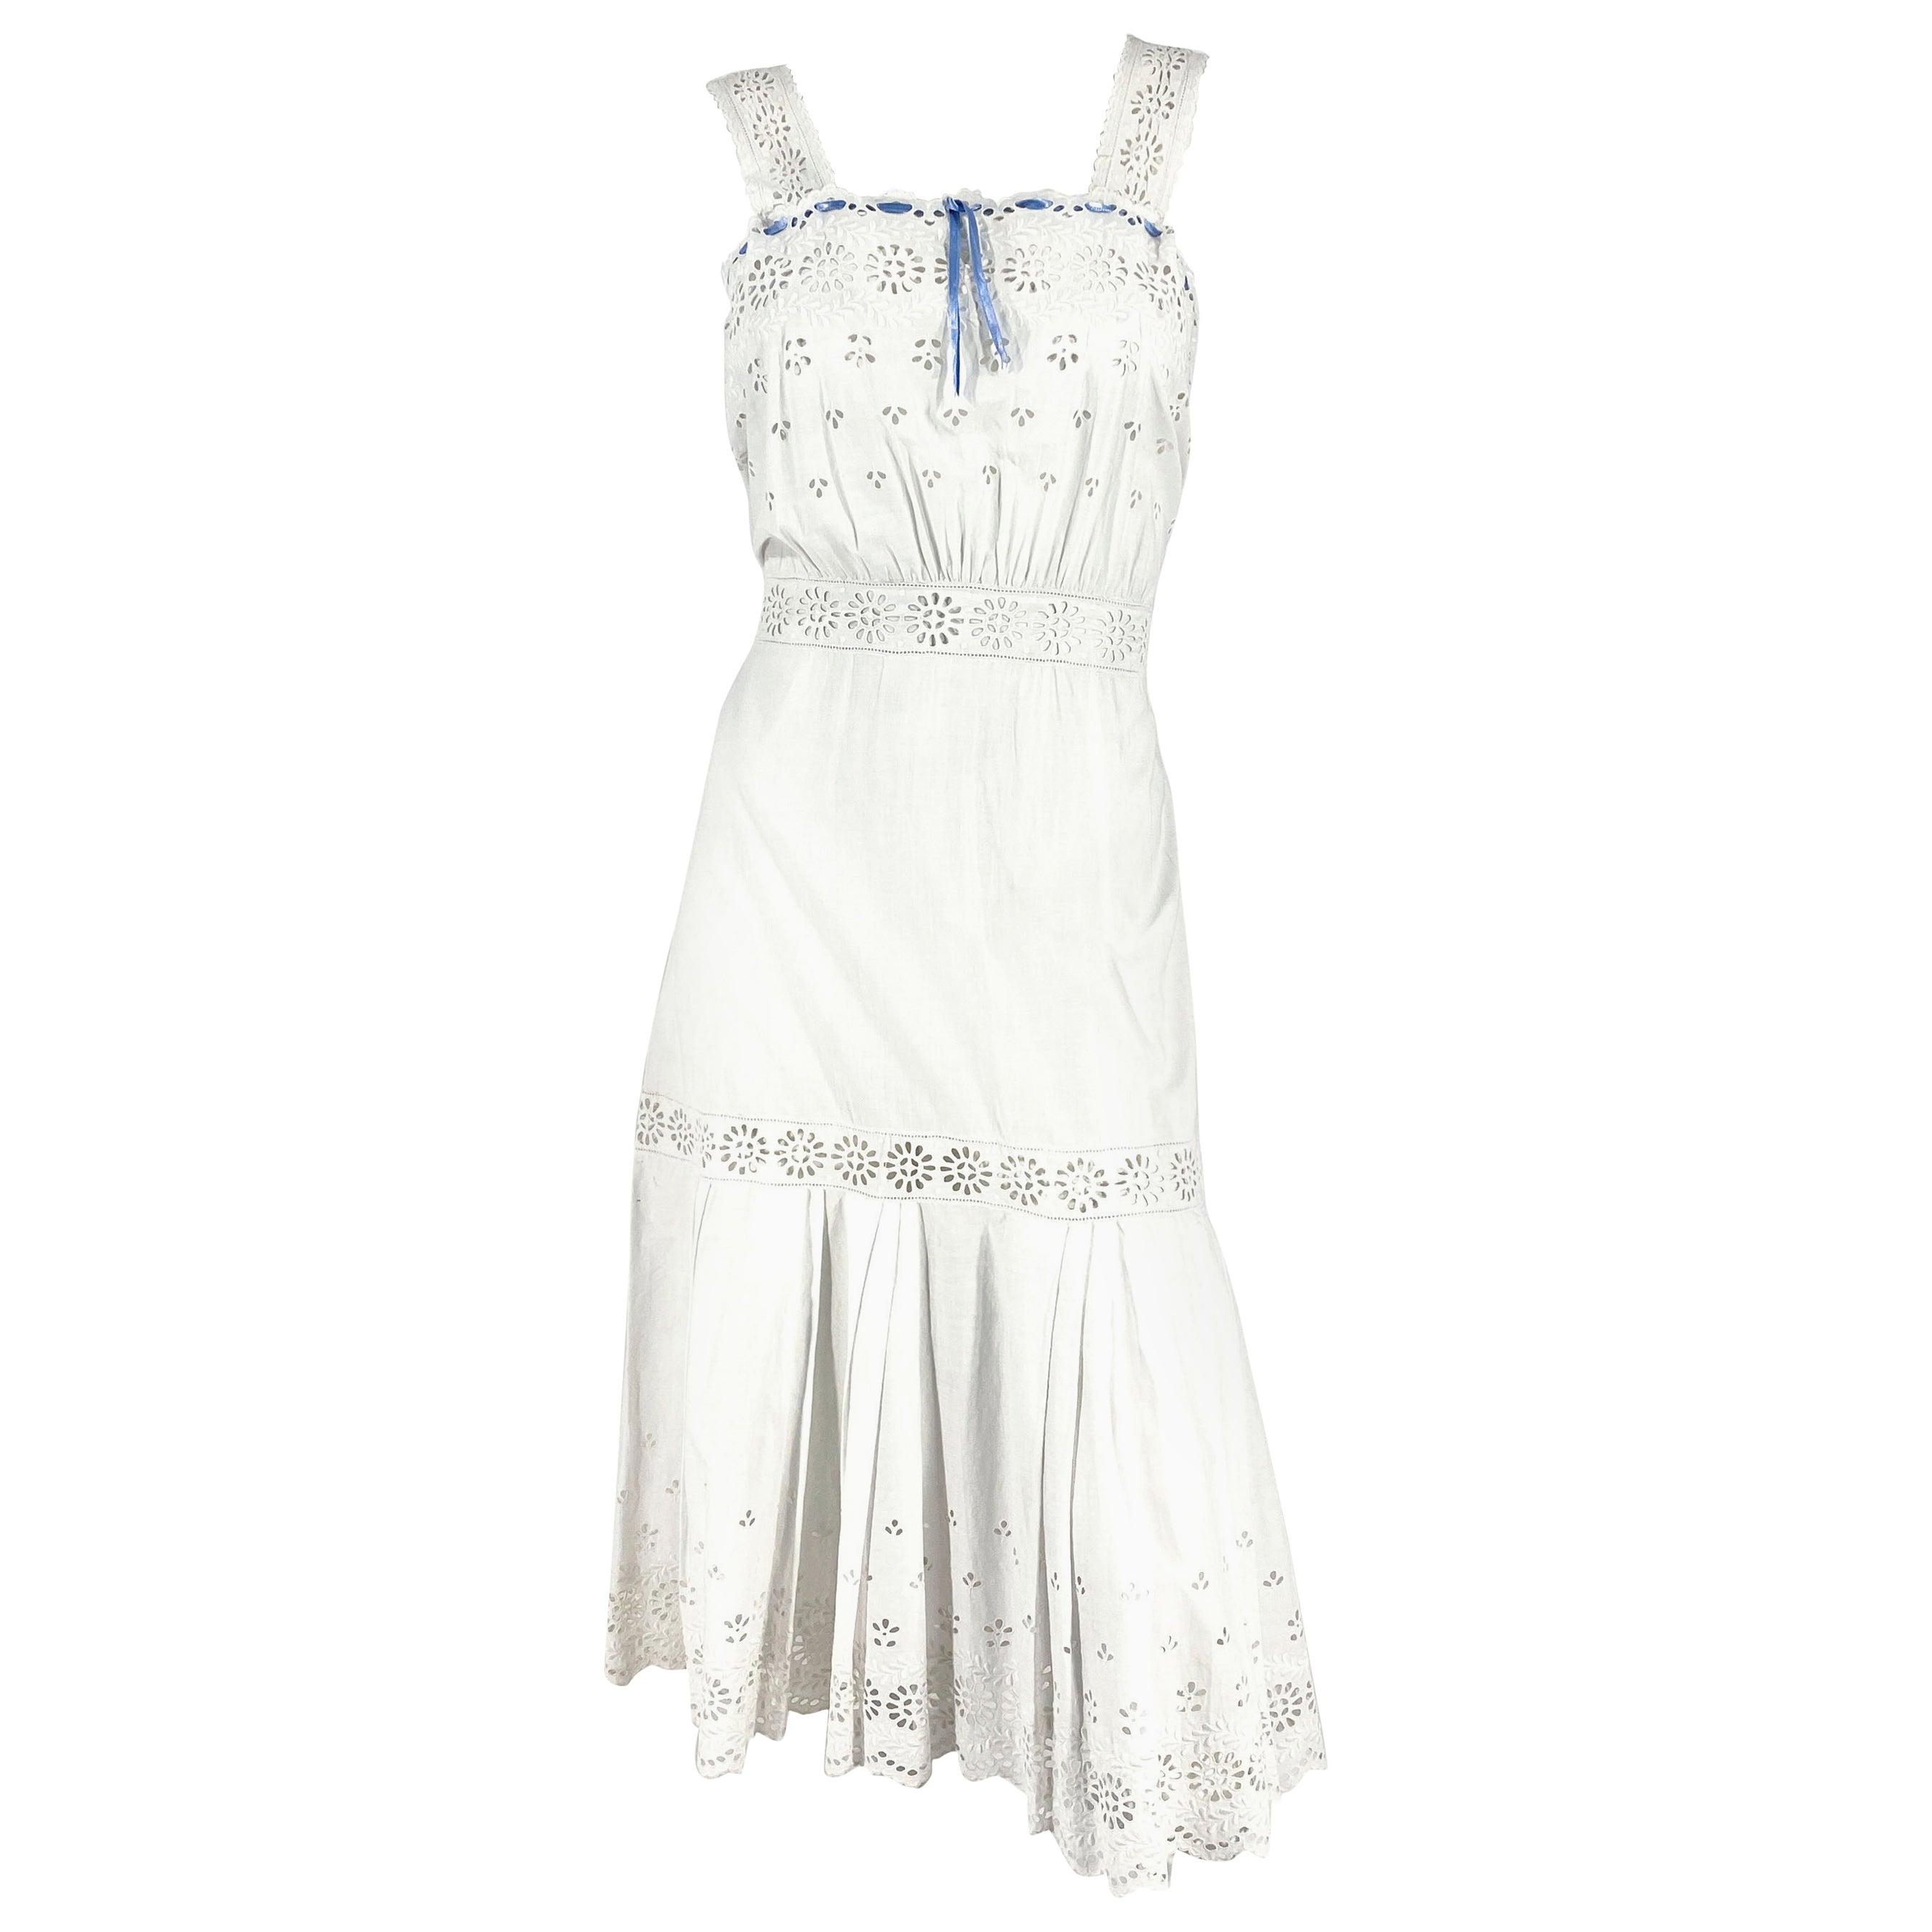 1900s Edwardian White Cotton Petticoat/Dress